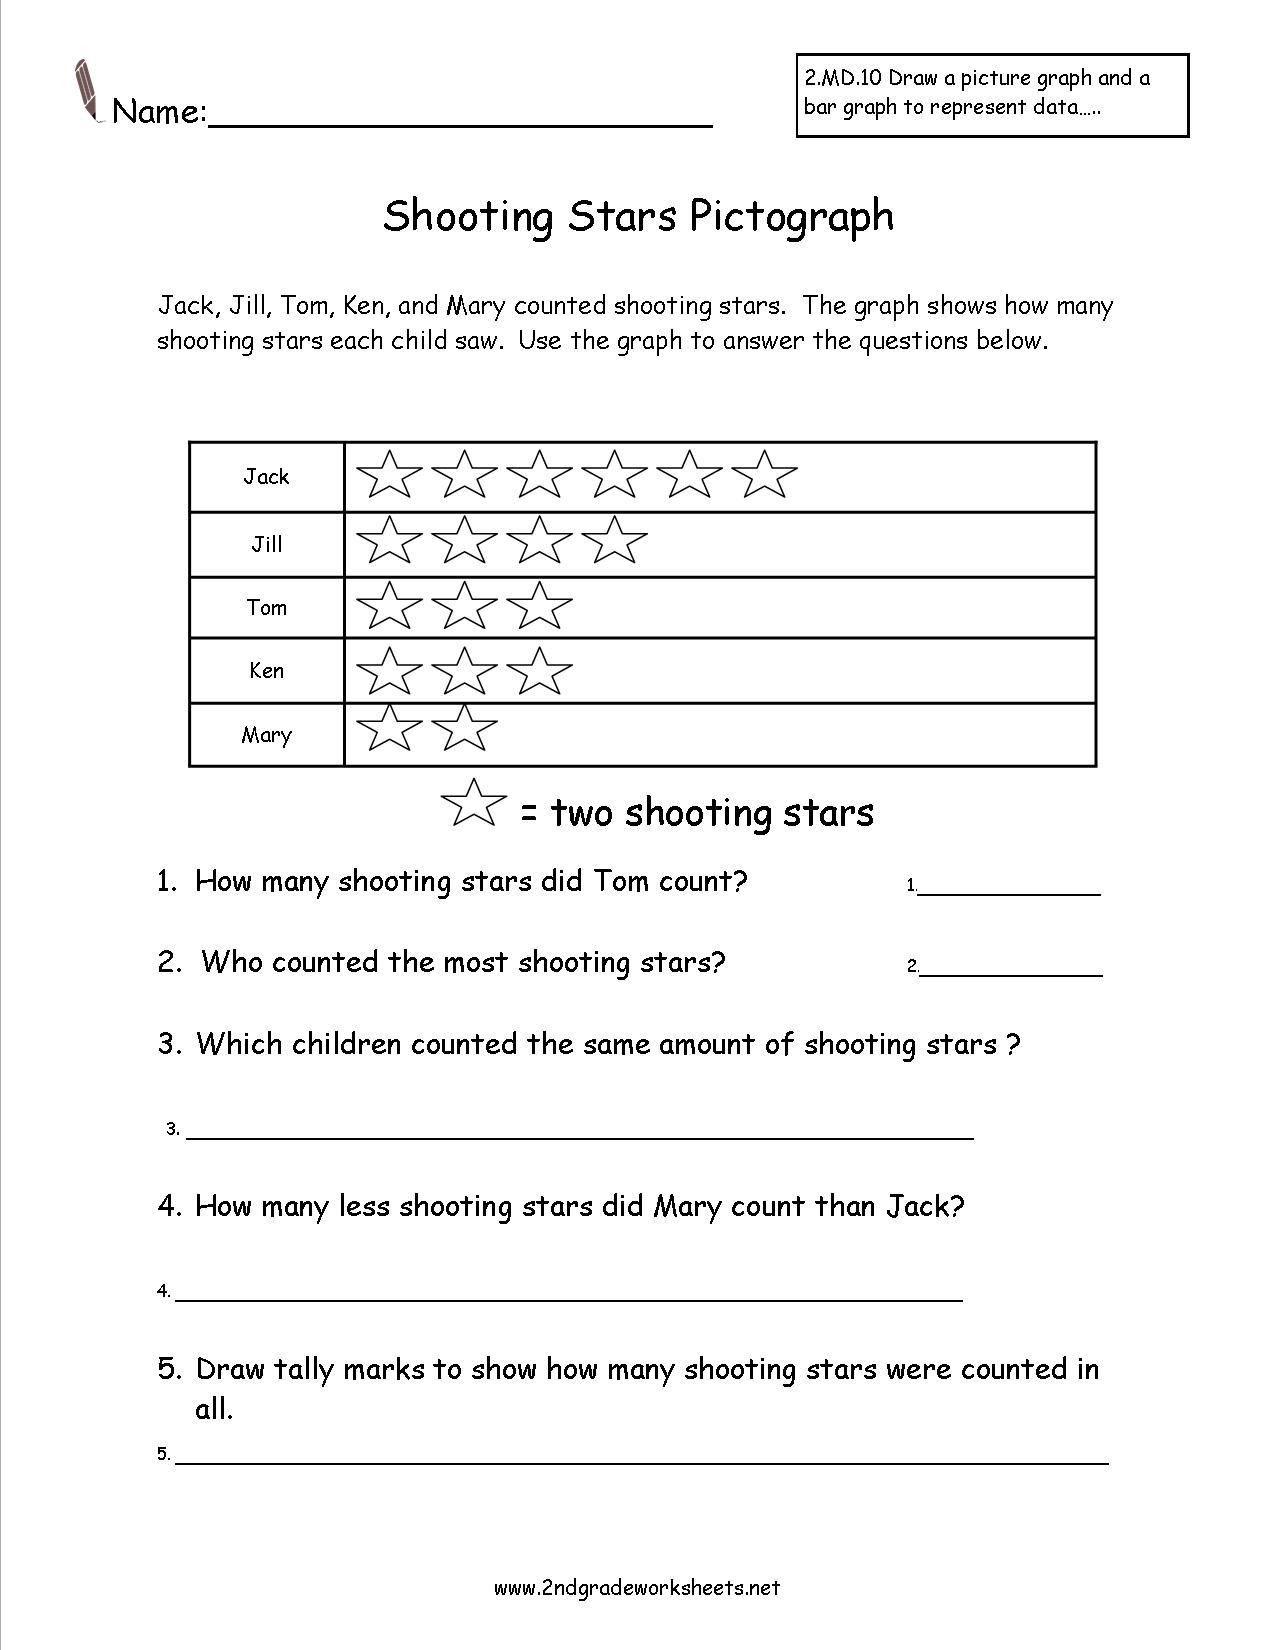 Pictograph Worksheets 2nd Grade Shooting Stars Pictograph Worksheet Third Grade Worksheets 2nd Grade Worksheets Phonics Worksheets [ 1650 x 1275 Pixel ]